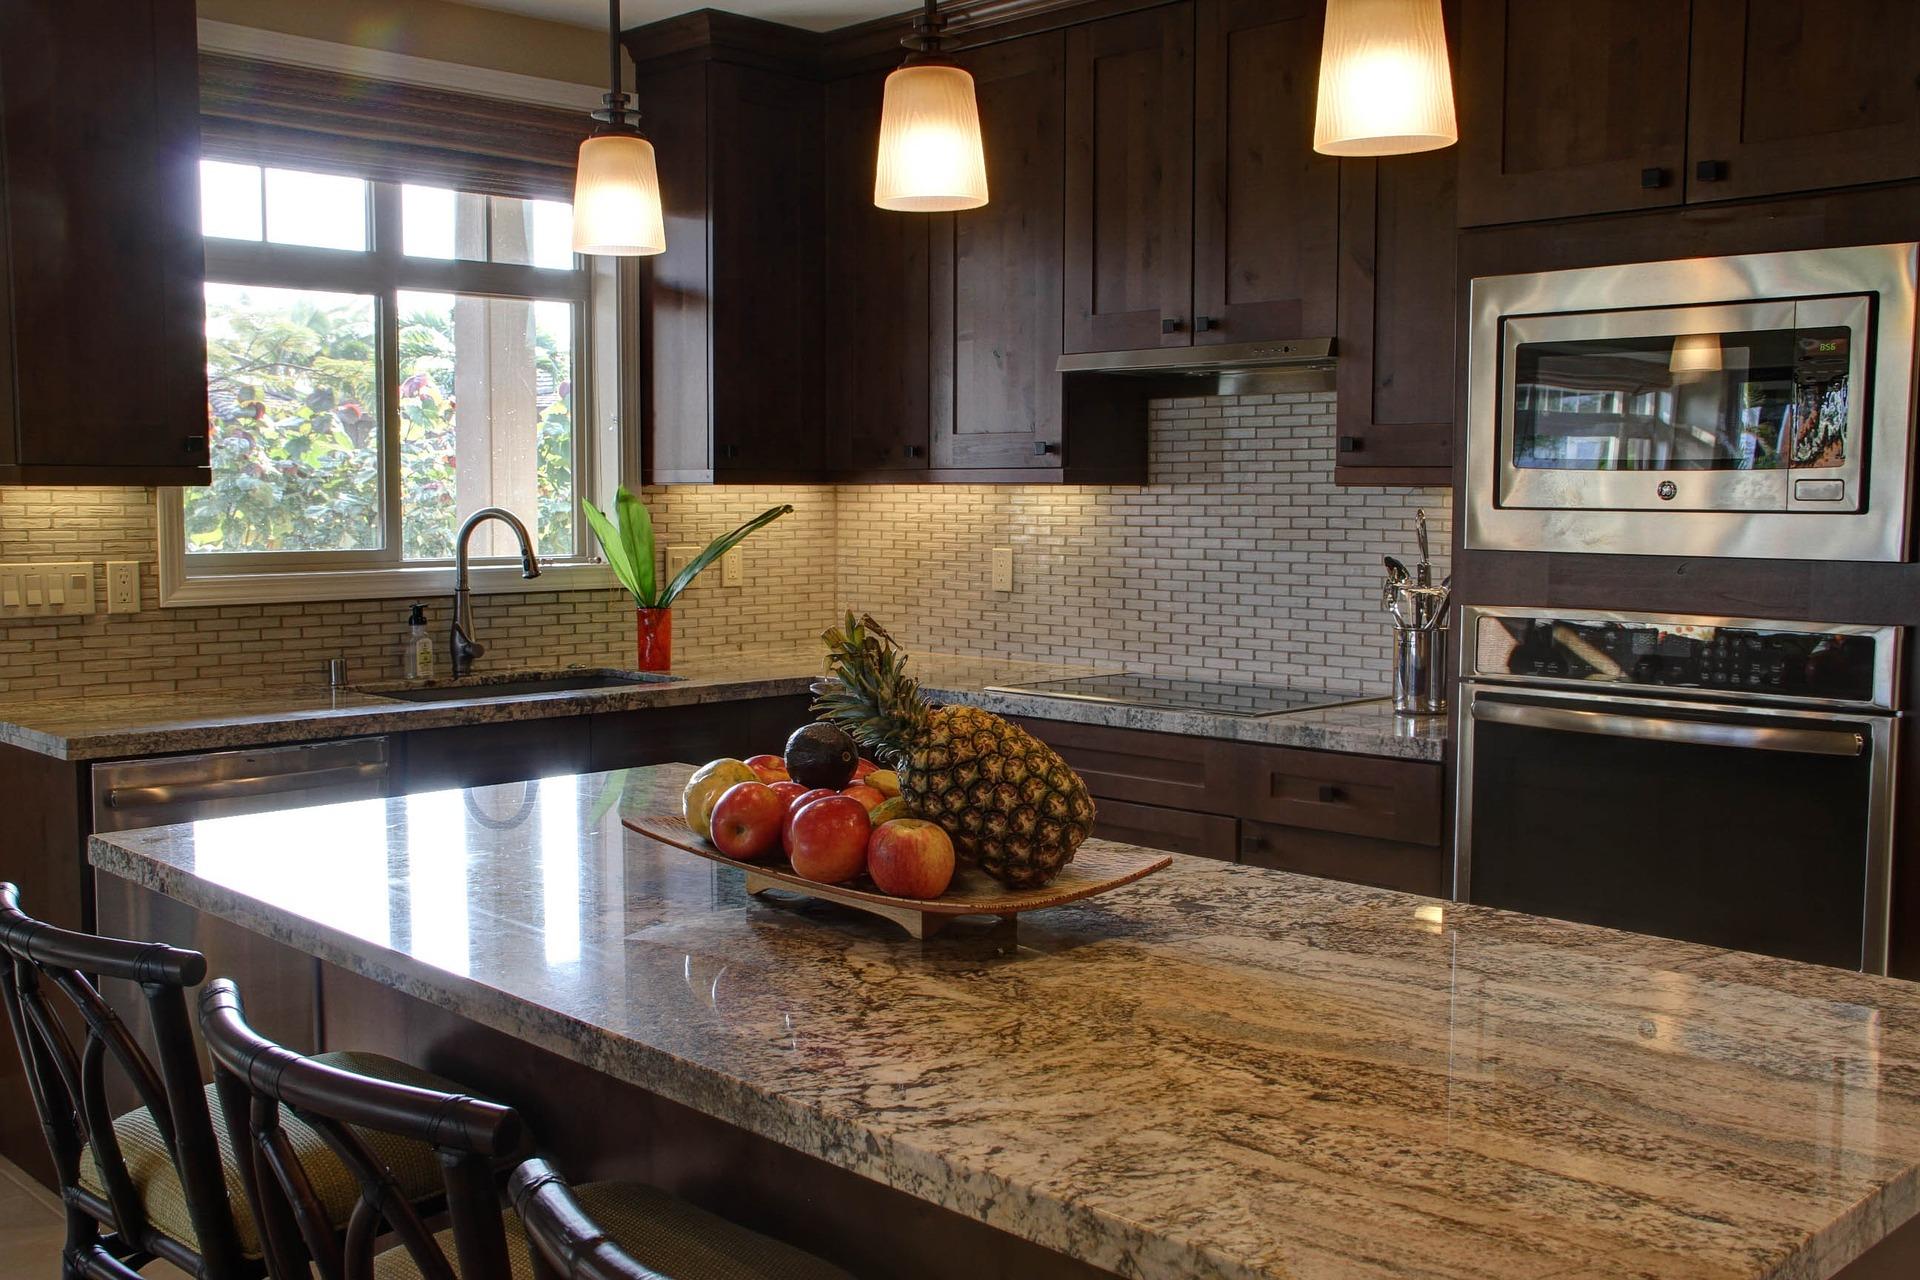 Кухонный фартук из светлого кирпича